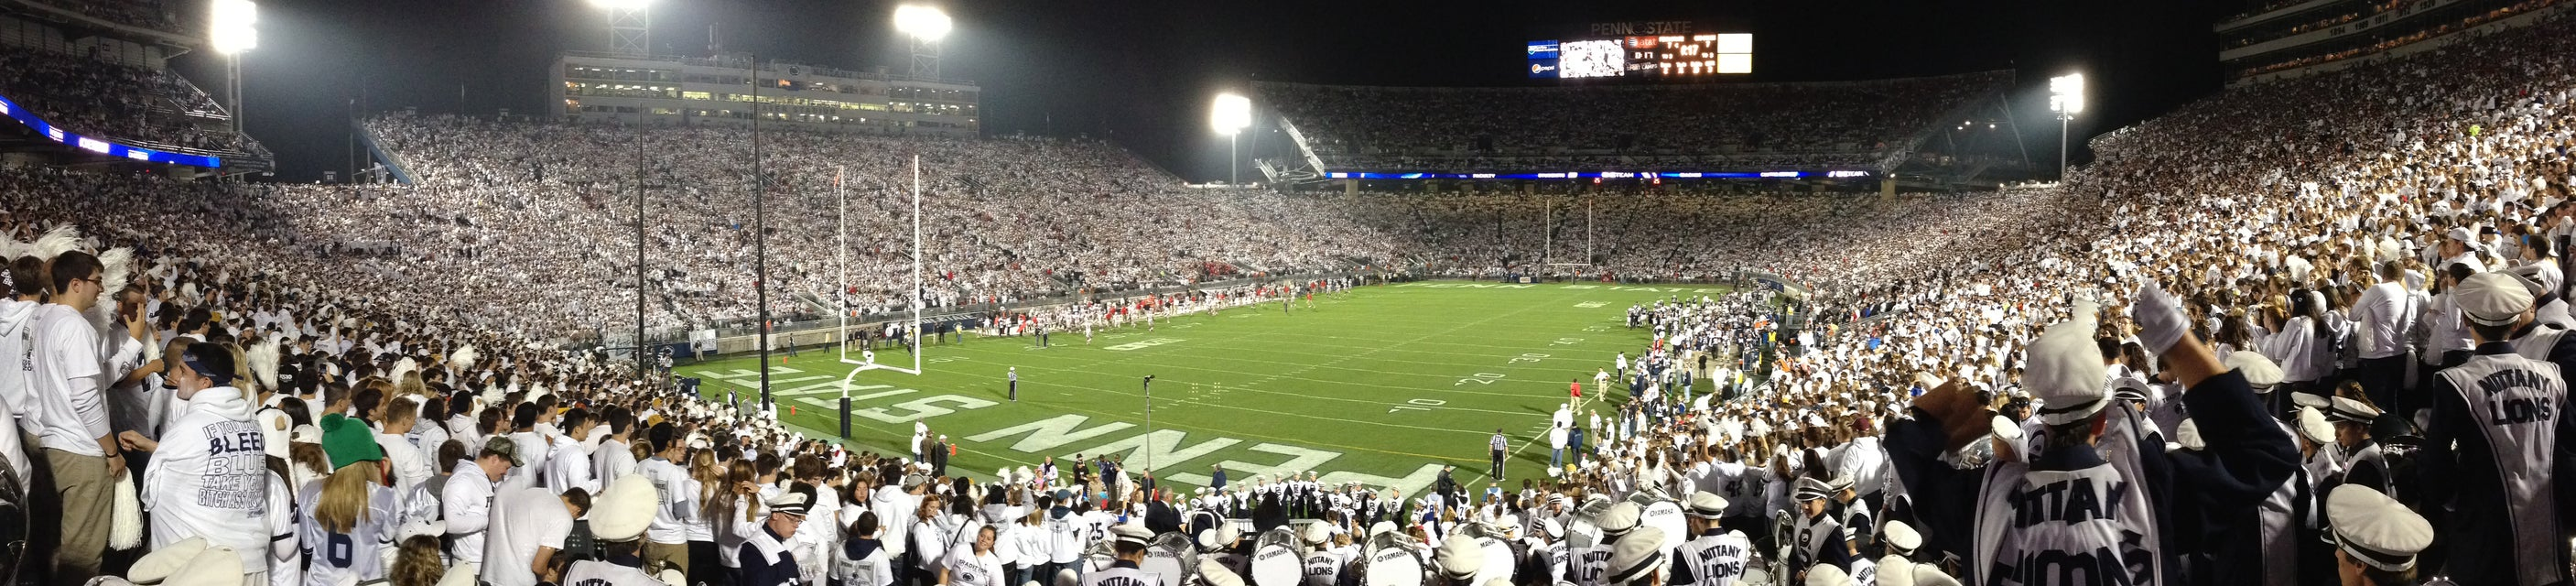 Penn State Football Tickets